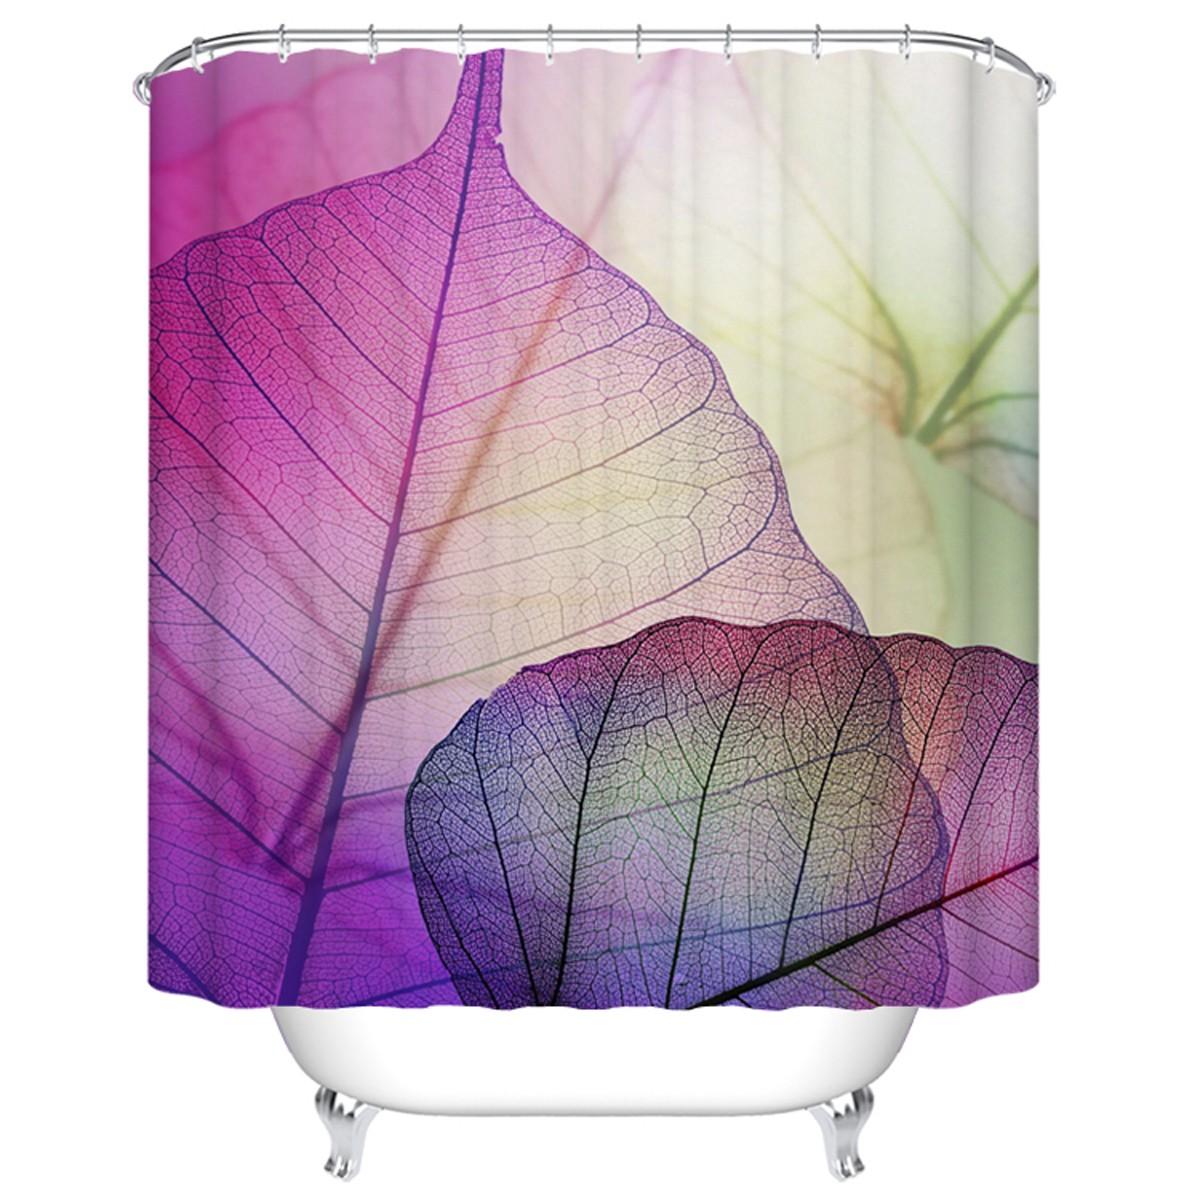 "Bathroom Waterproof Shower Curtain, 70"" W x 72"" H (DK-YT020)"